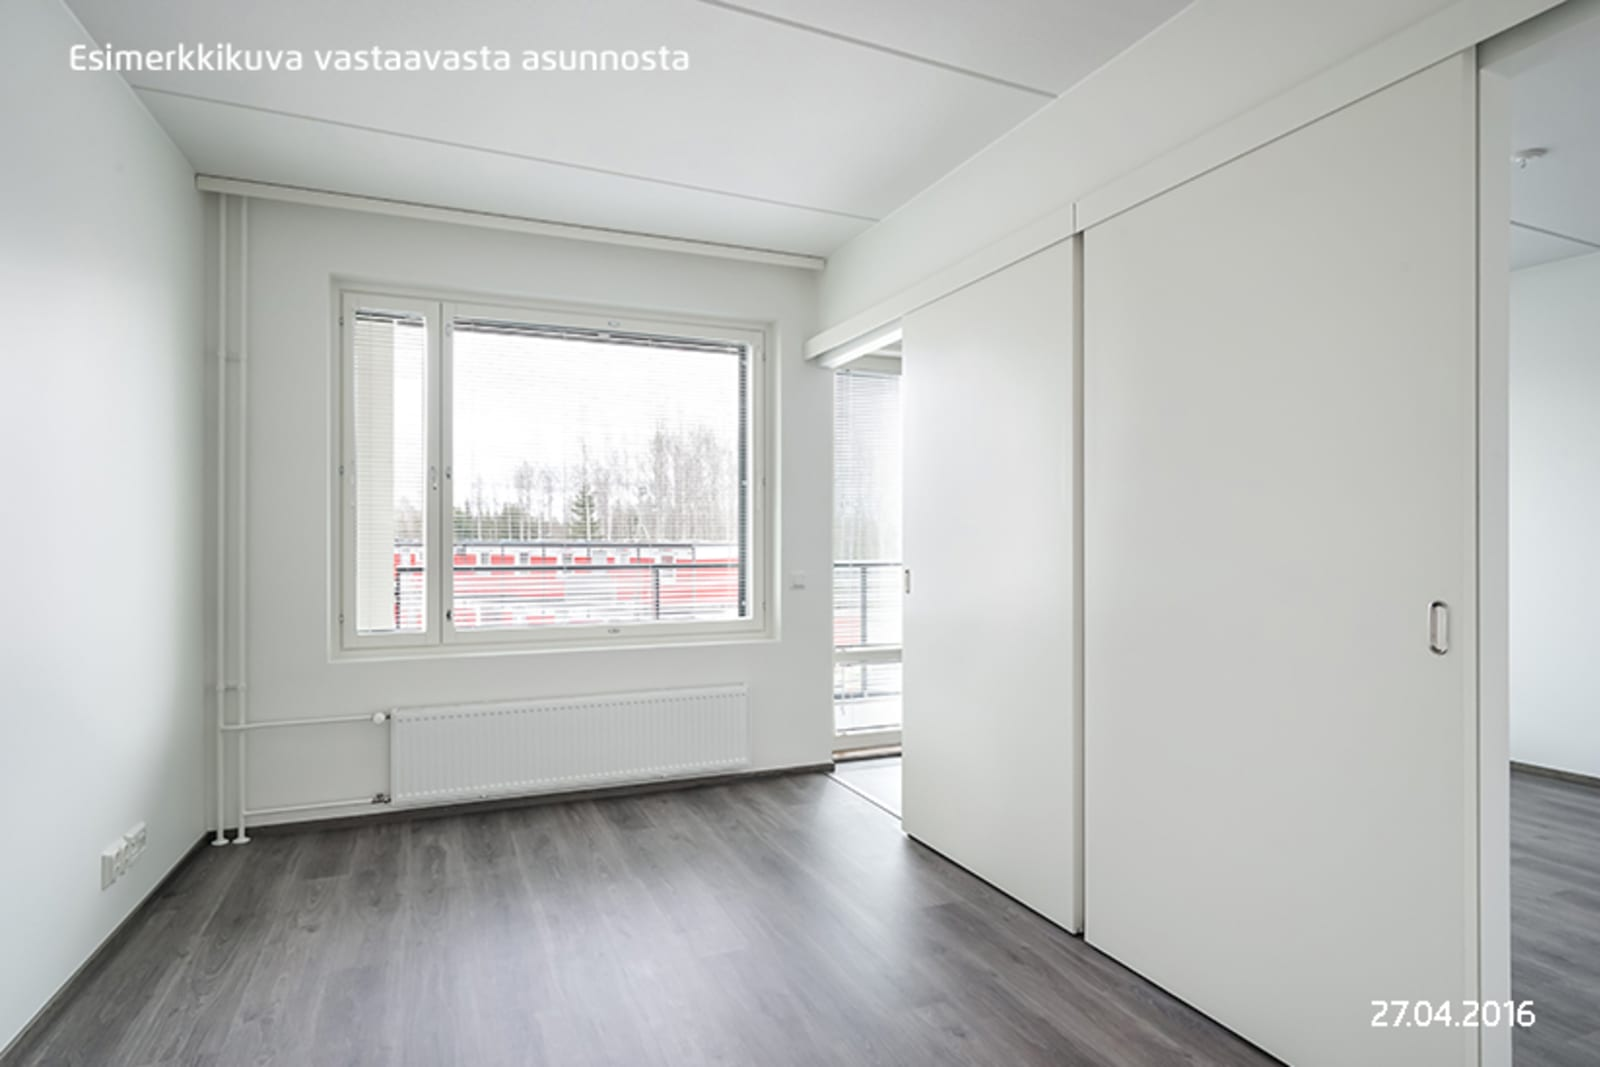 Vantaa, Keimolanmäki, Leksankuja 3 B 034